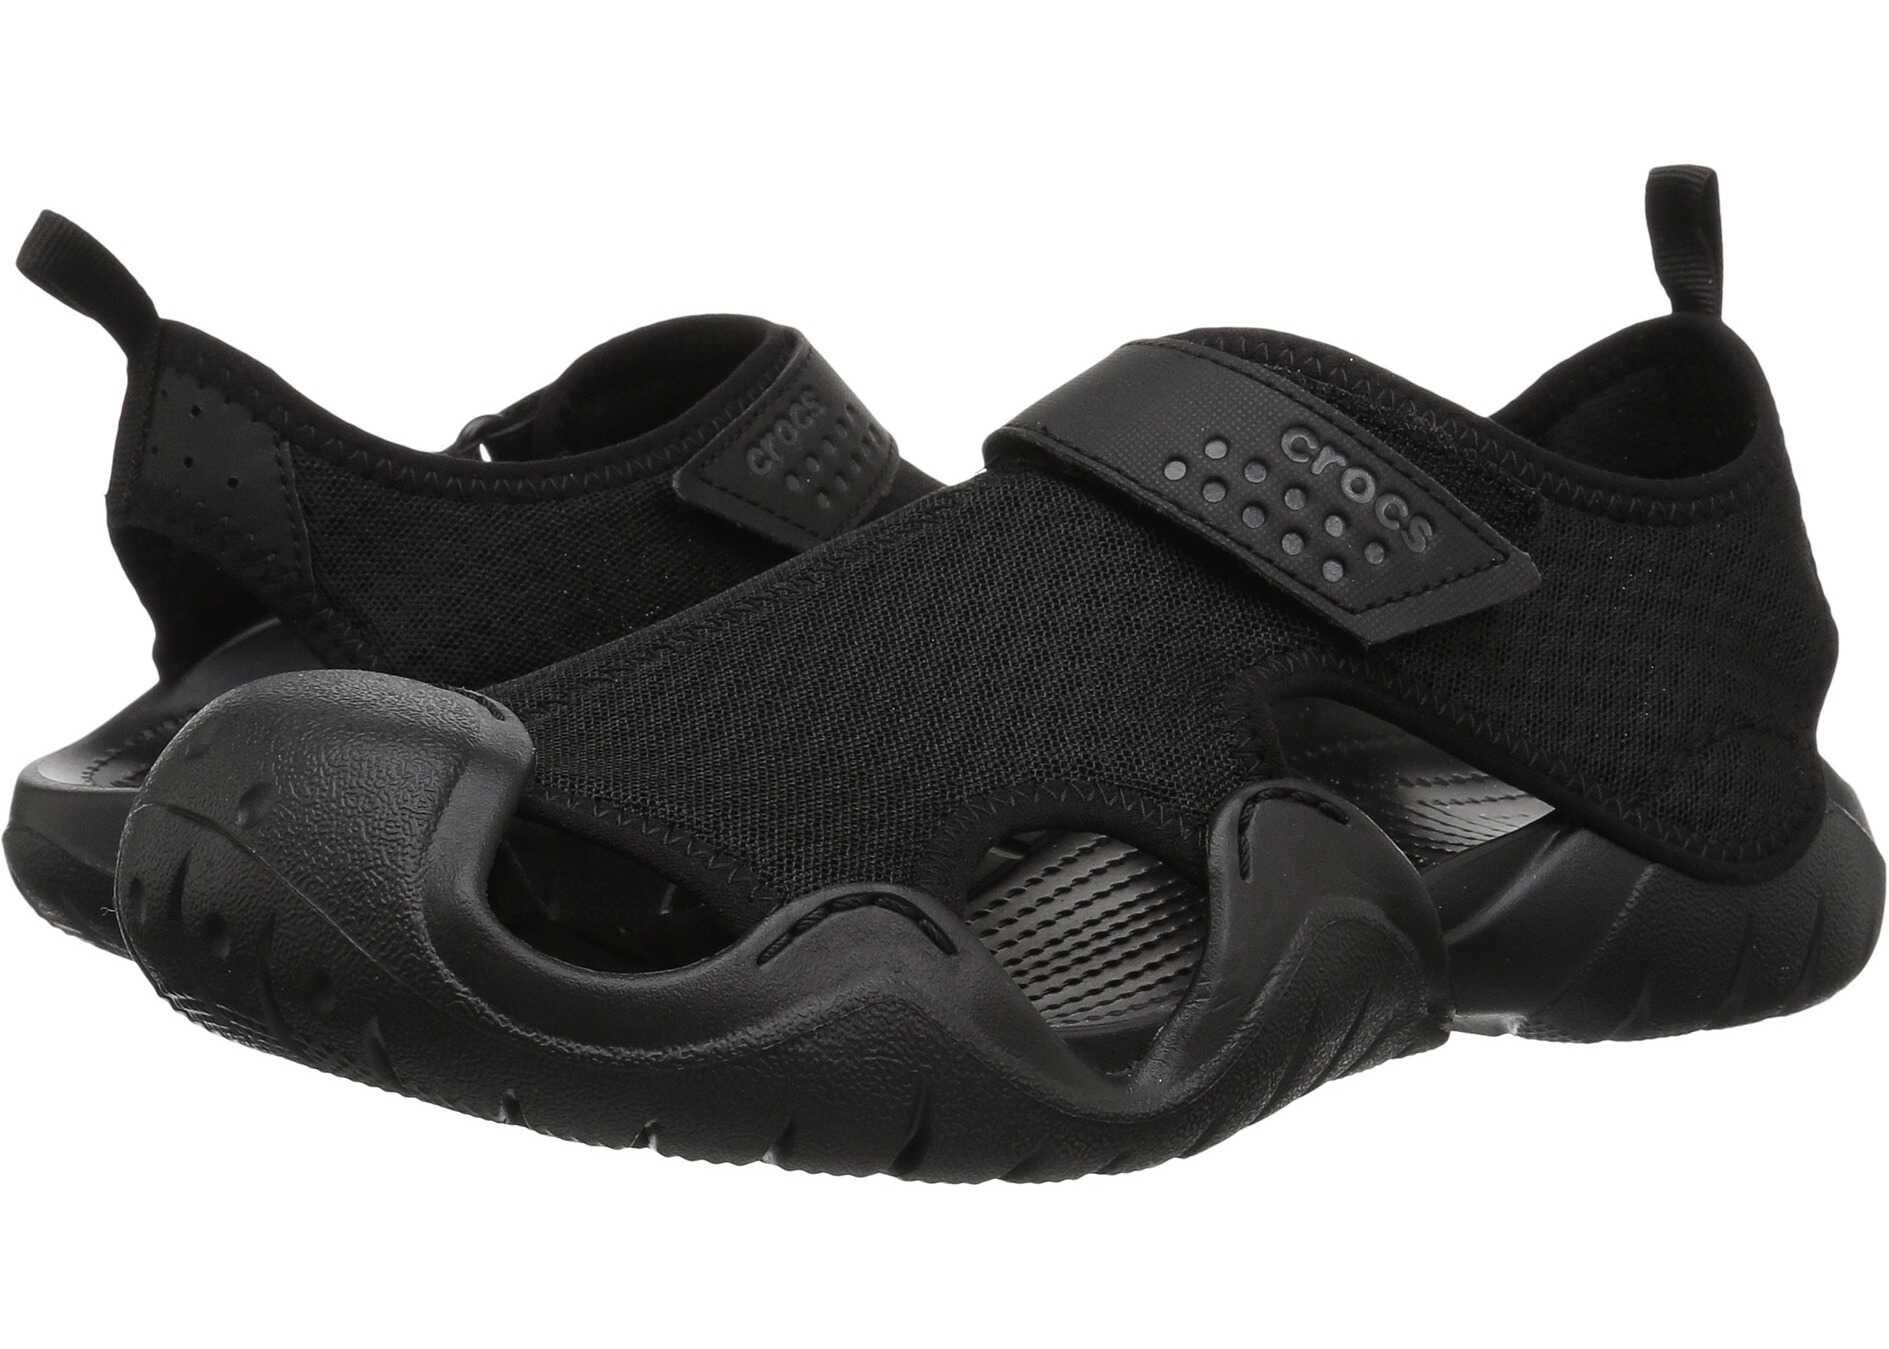 Crocs Swiftwater Sandal Black/Black